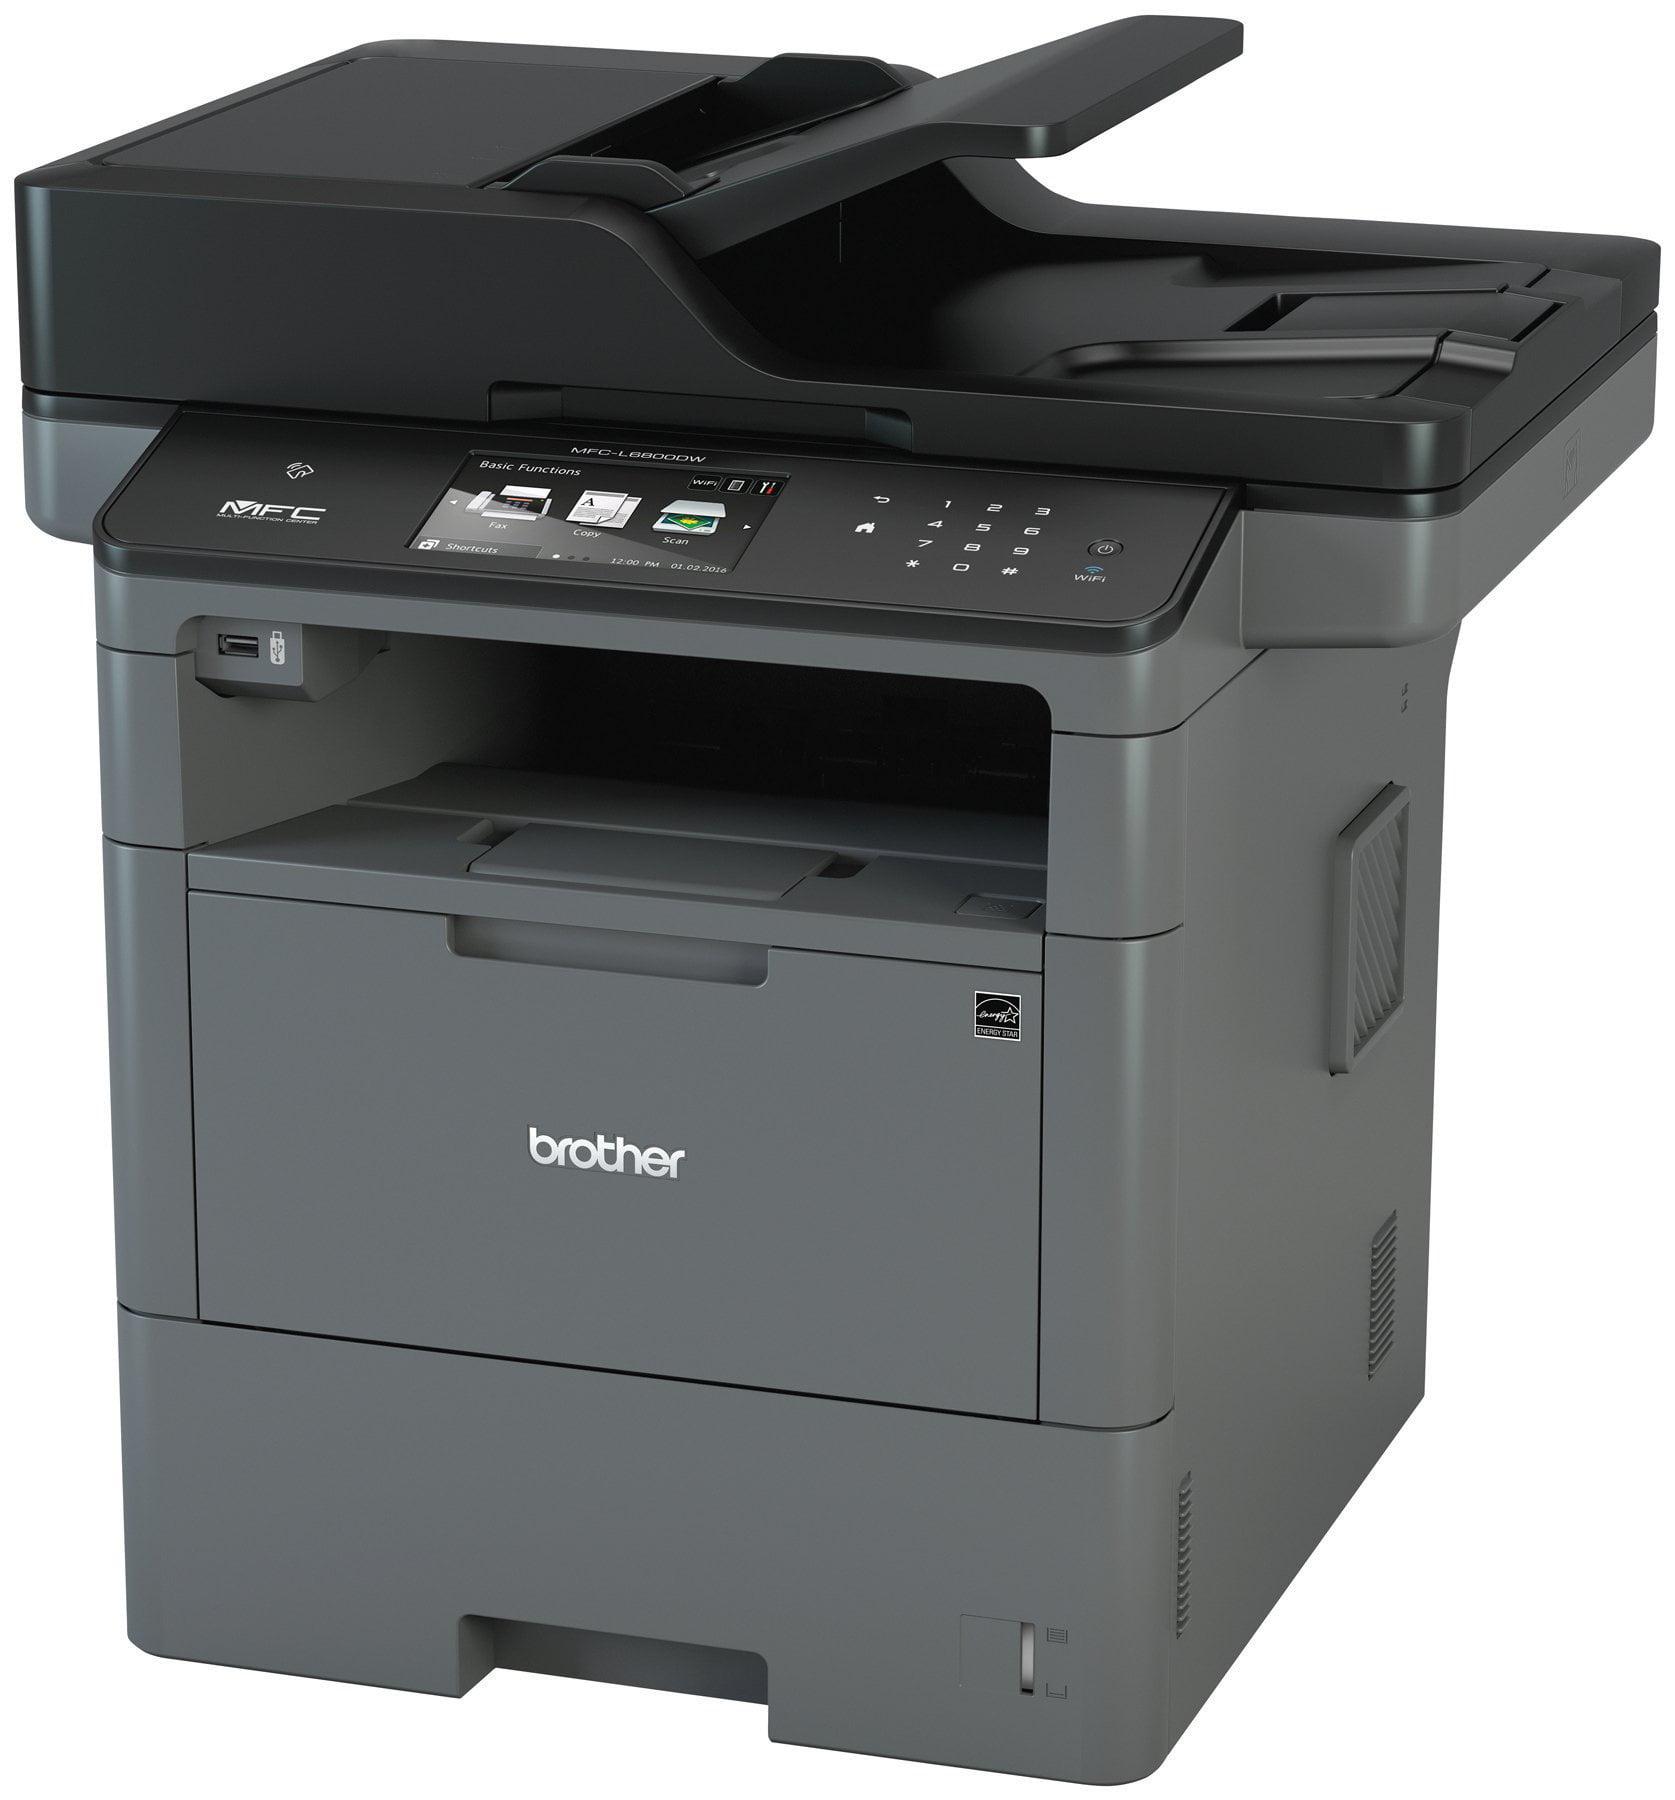 Brother Mfc-l6800dw Laser Multifunction Printer Monochrome Plain Paper Print Desktop Copier fax printer scanner 48 Ppm... by Brother